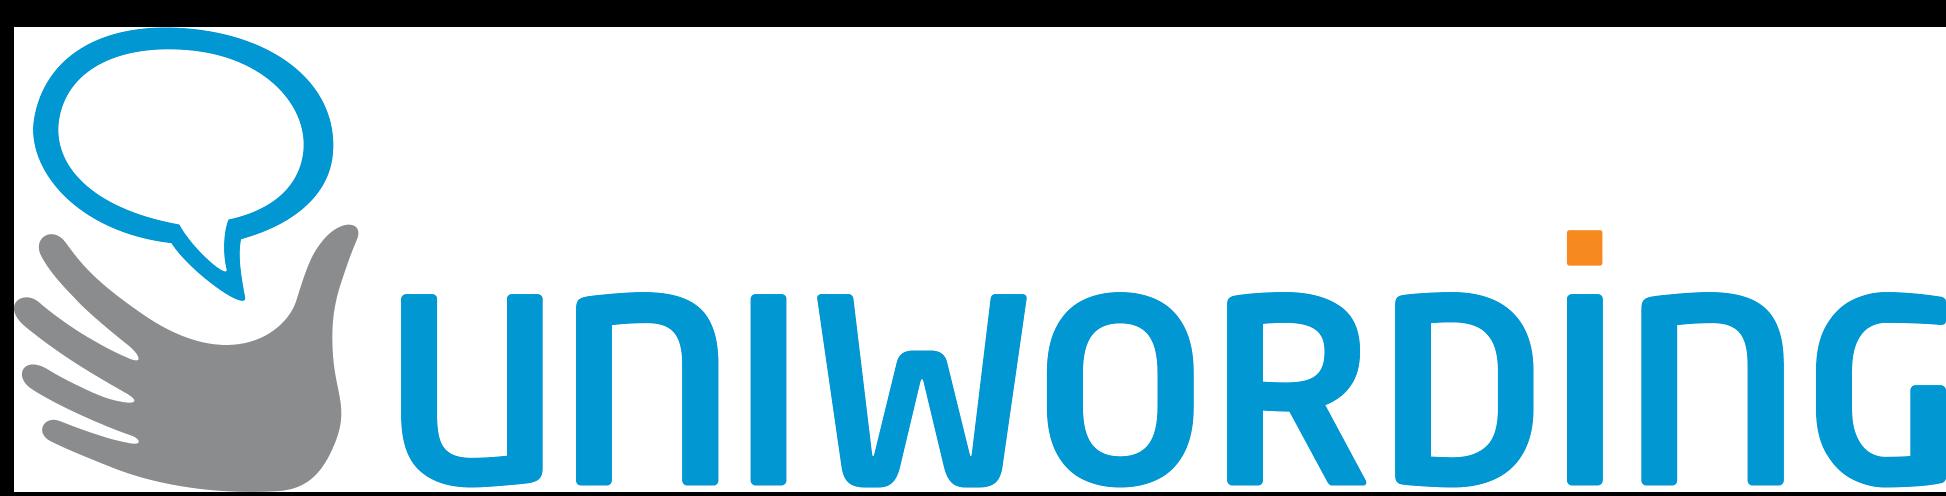 uniwording_logo